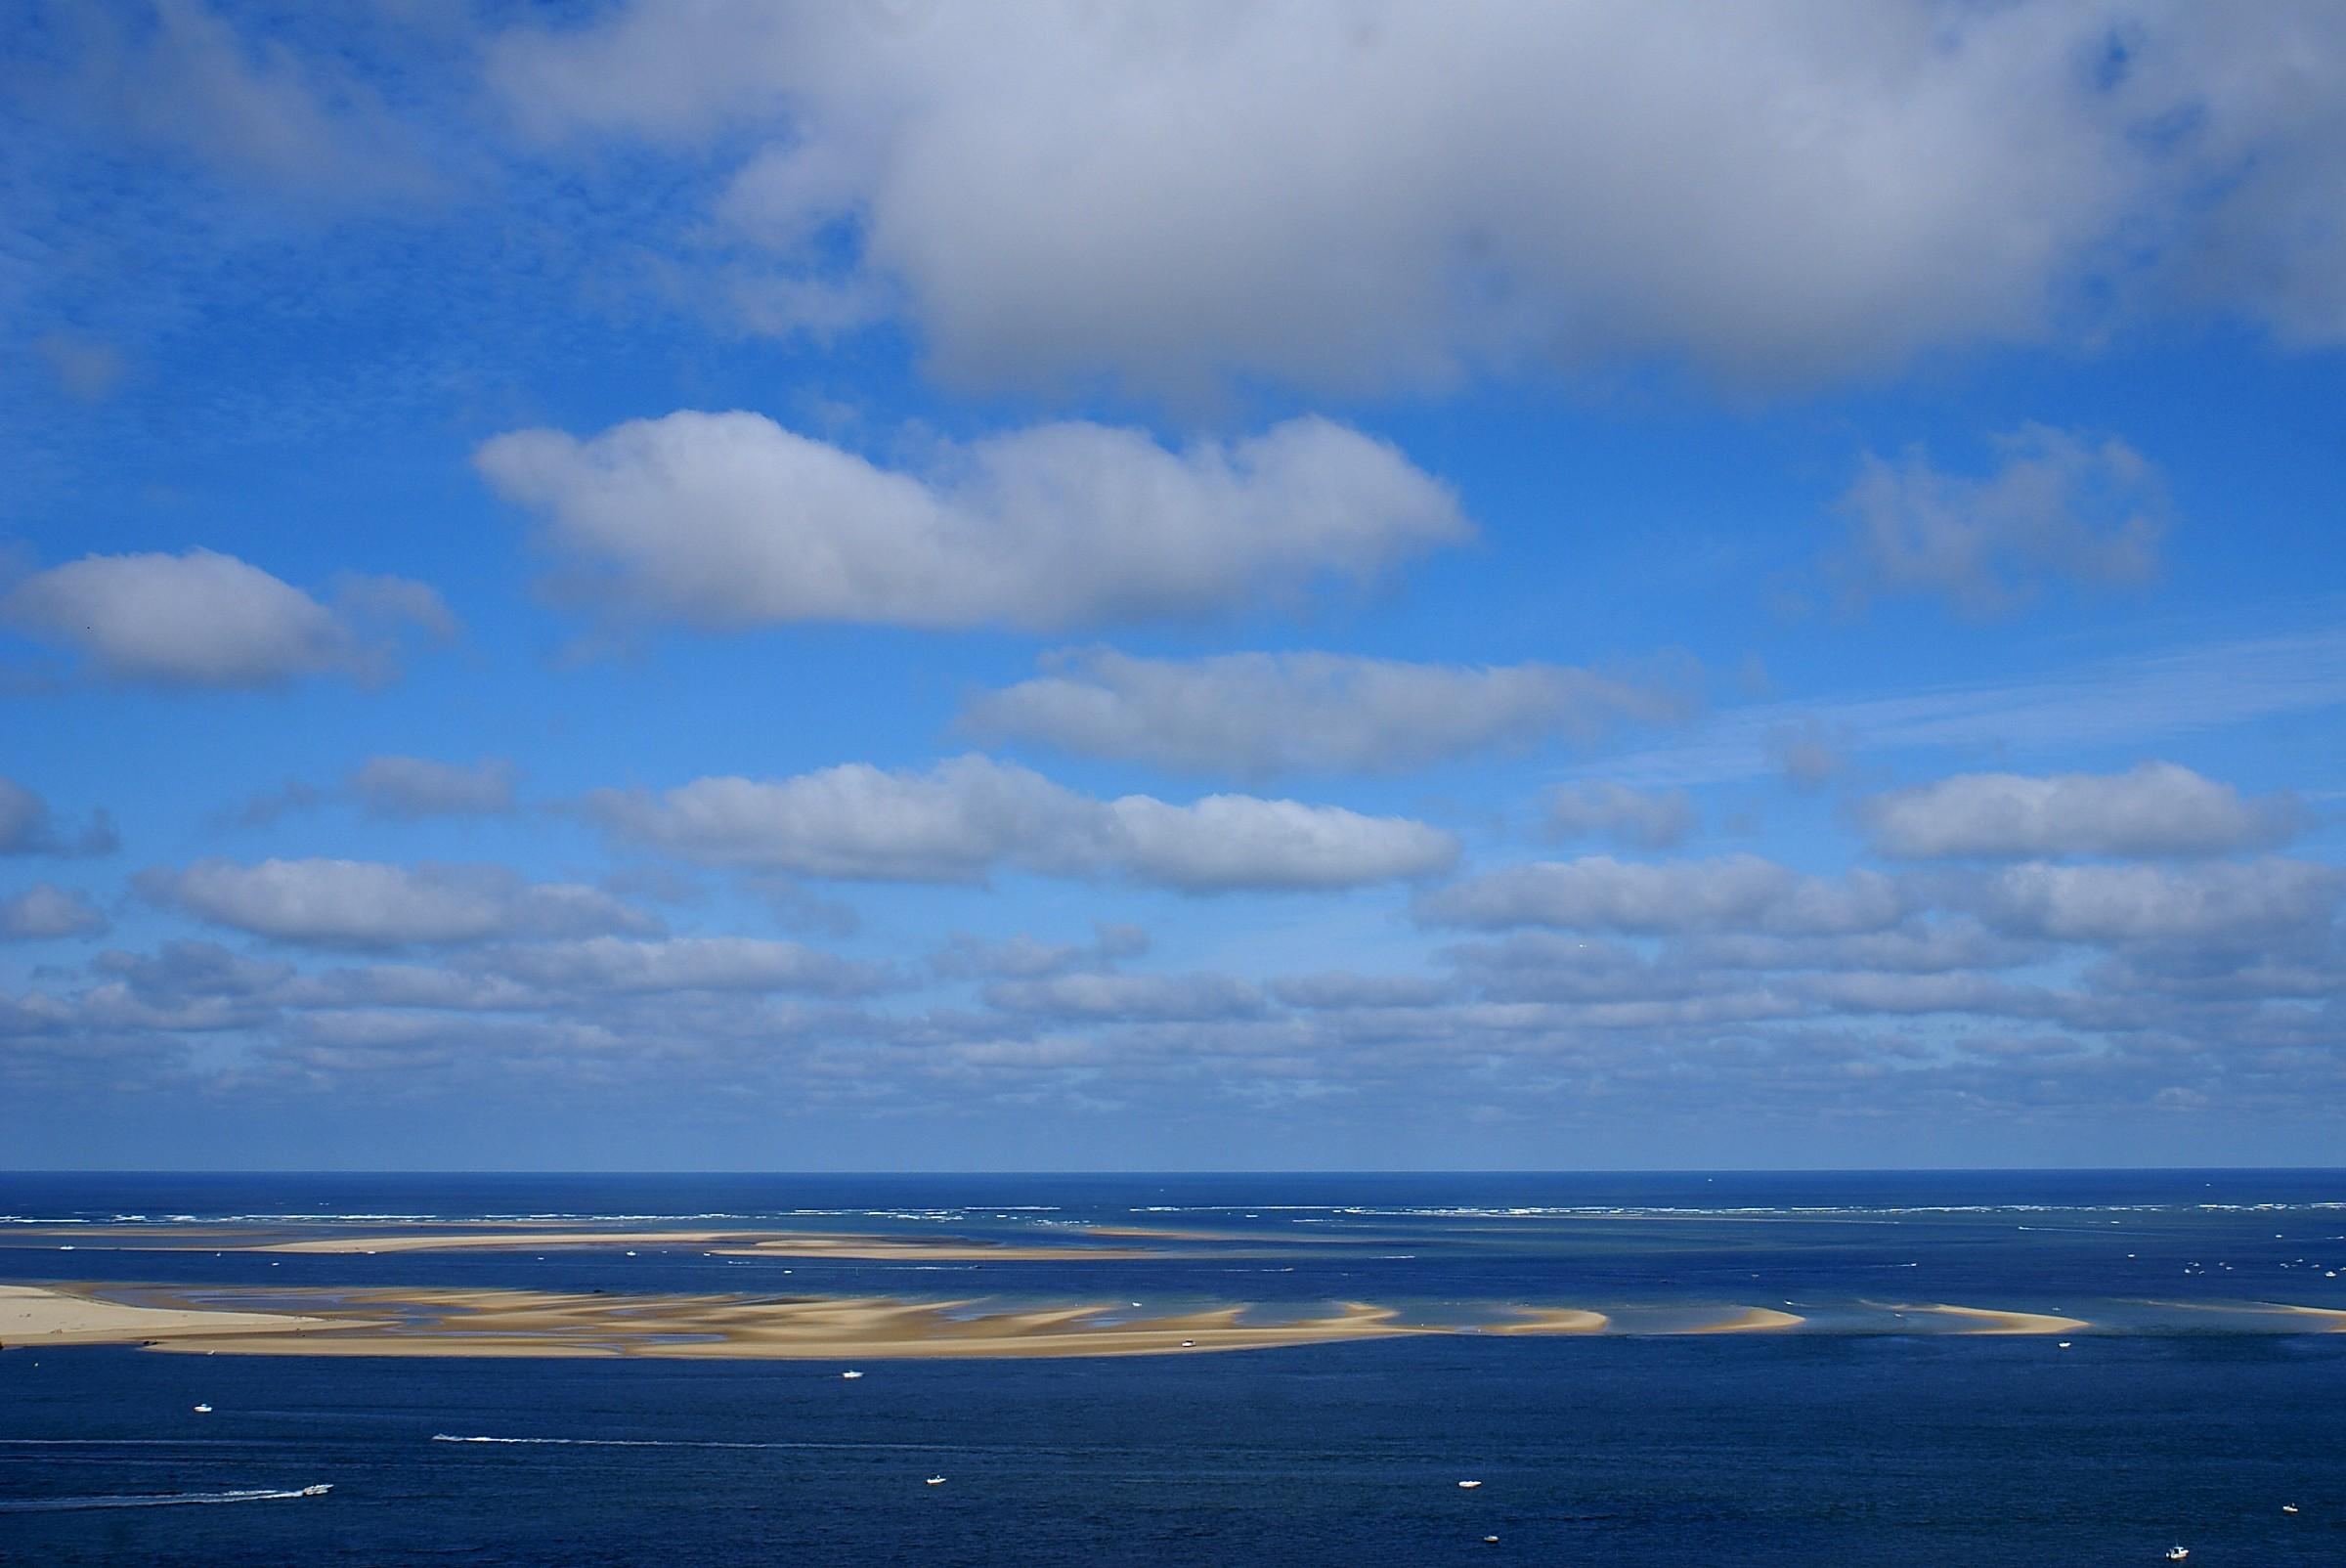 Oceano  e sabbia giocano a rimpiattino: Banc d'Arguin...